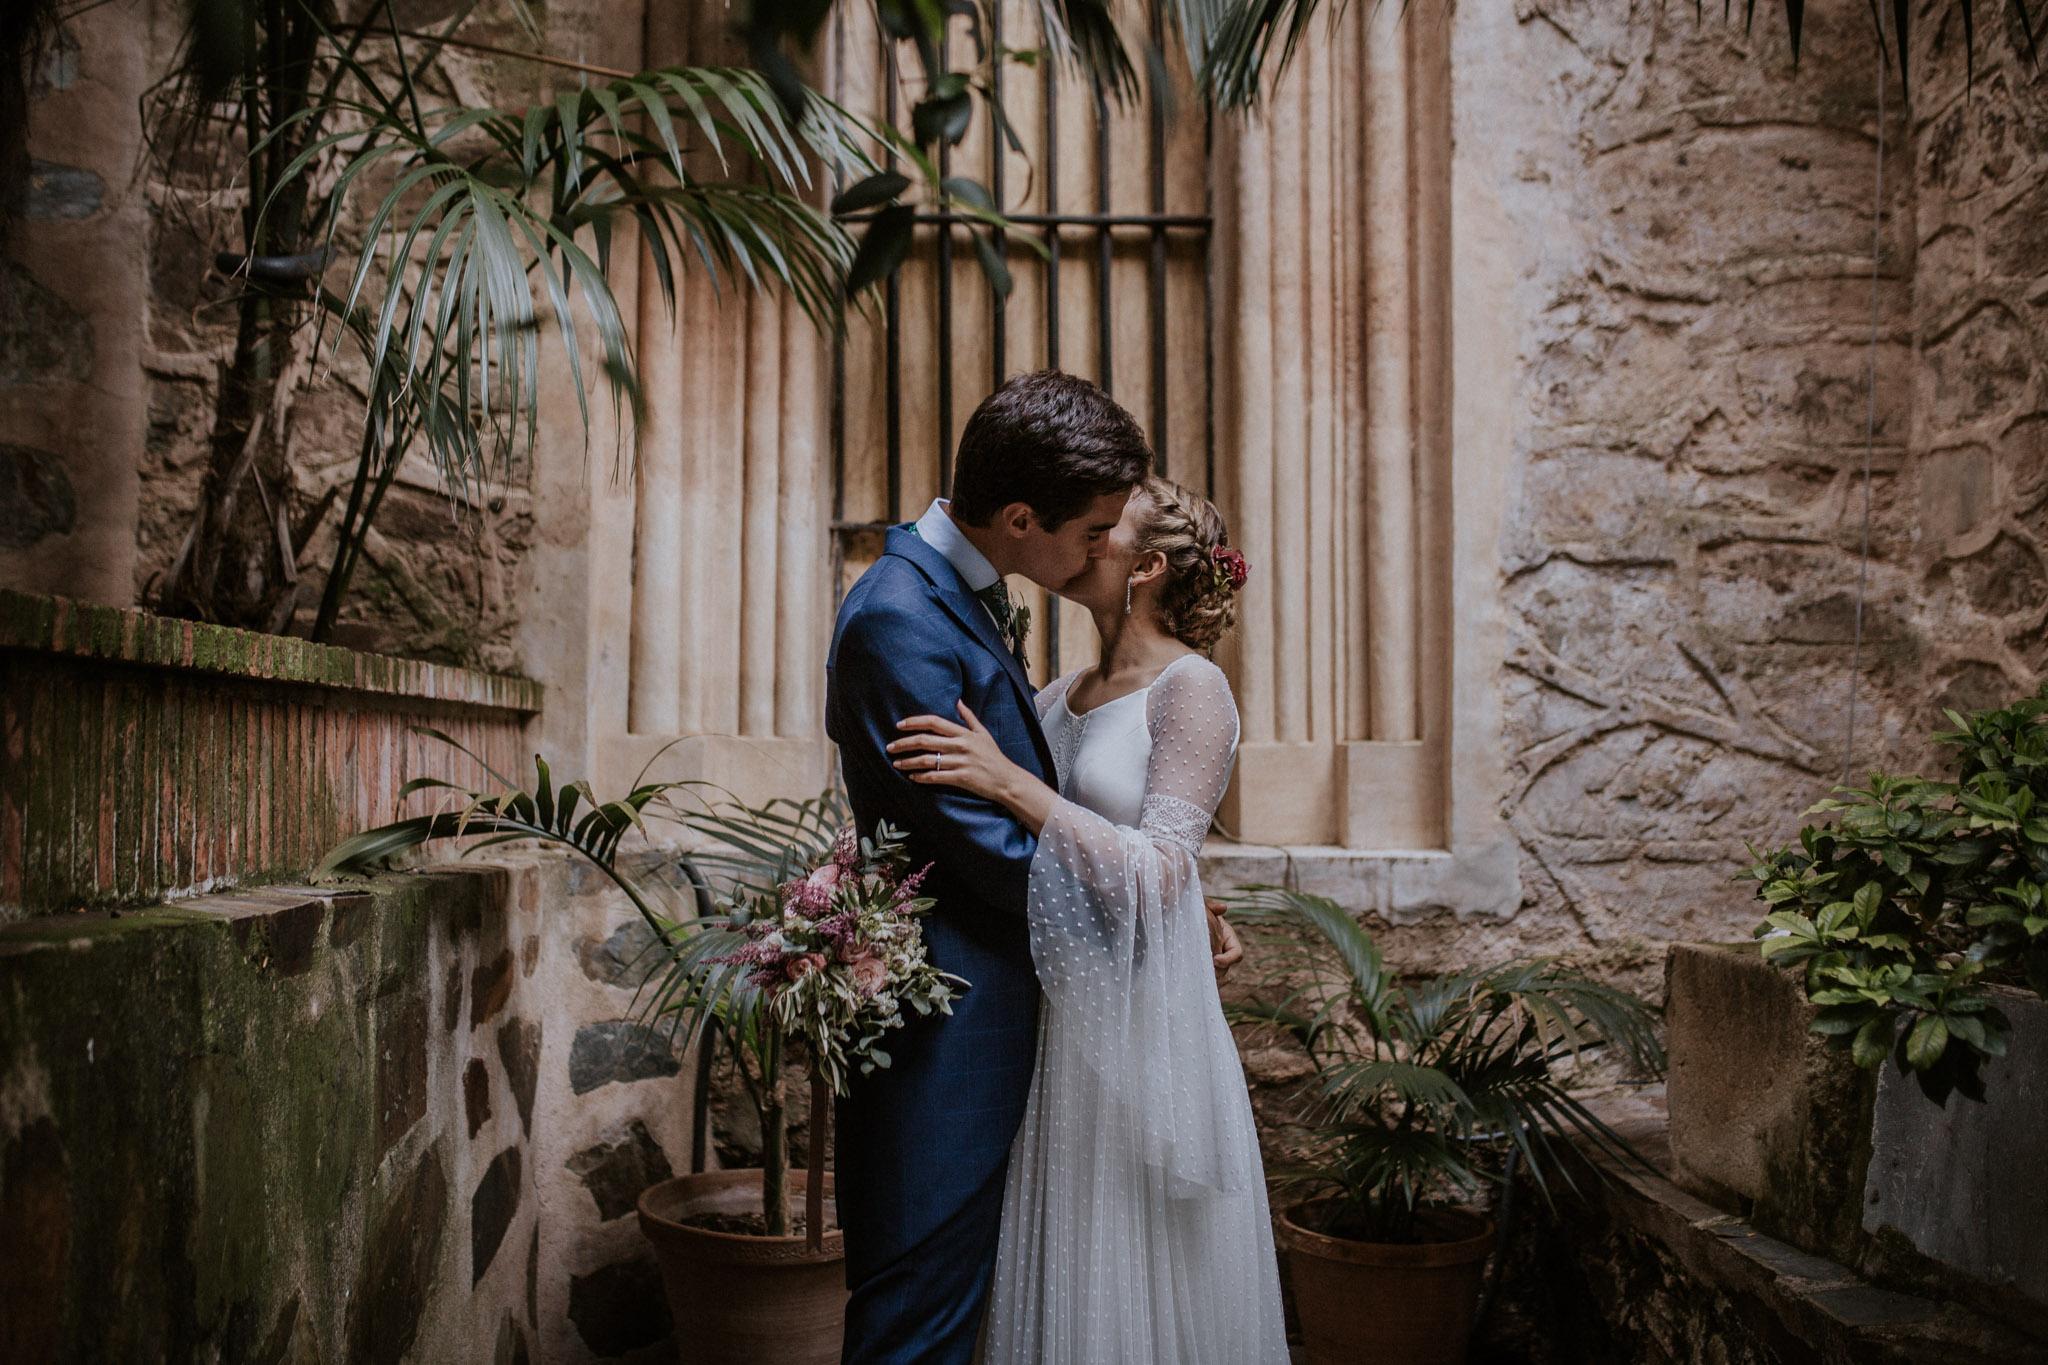 fotografia-boda-wedding-photographer-spain-concorazon-226